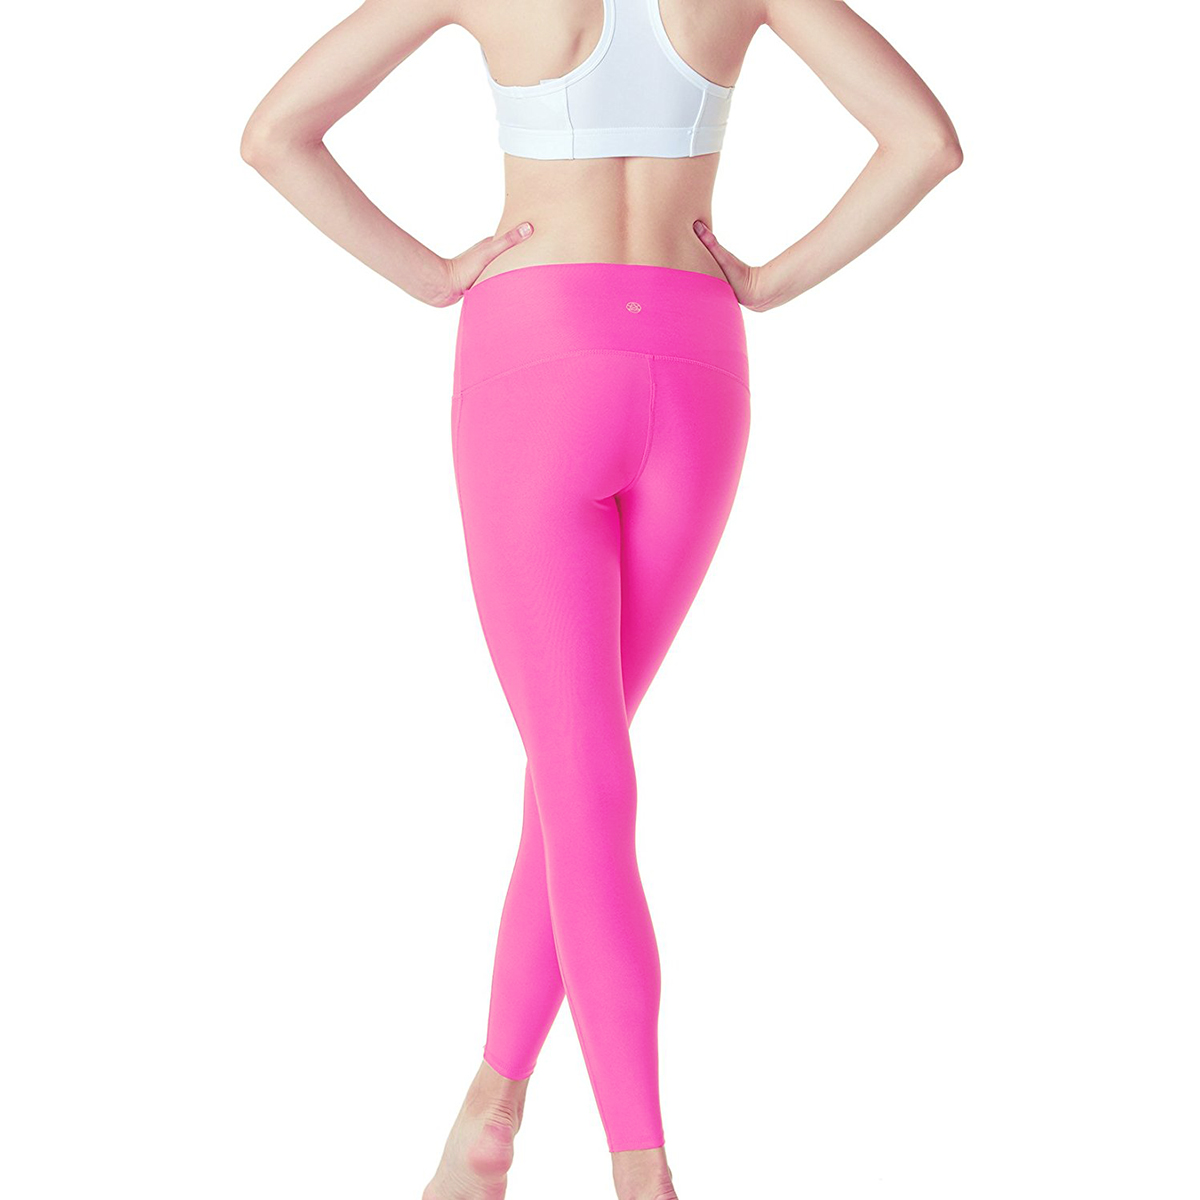 thumbnail 50 - TSLA Tesla FYP42 Women's High-Waisted Ultra-Stretch Tummy Control Yoga Pants